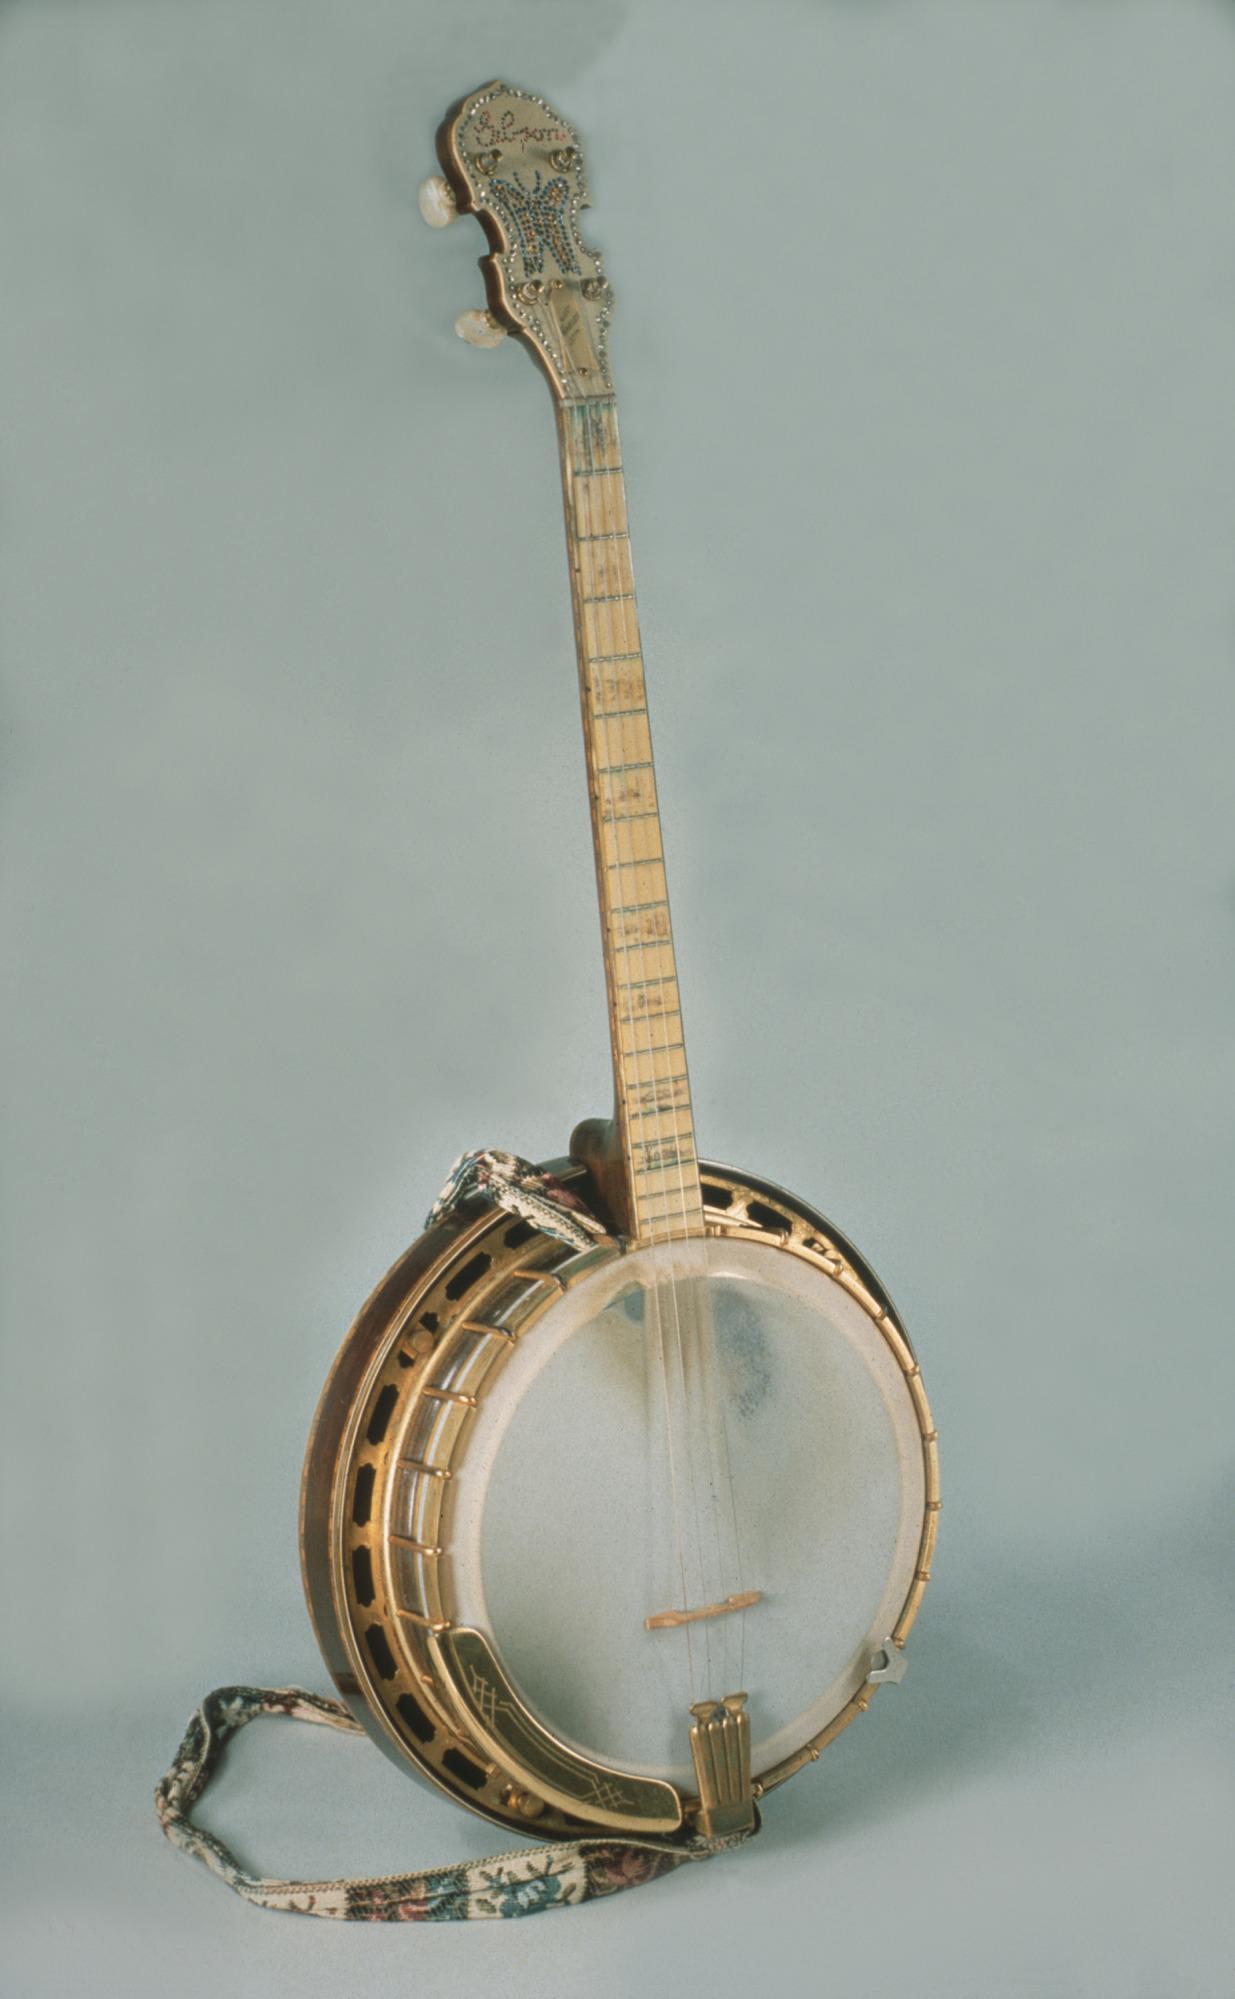 Image 1 for Frances Chenoweth's Tenor Banjo